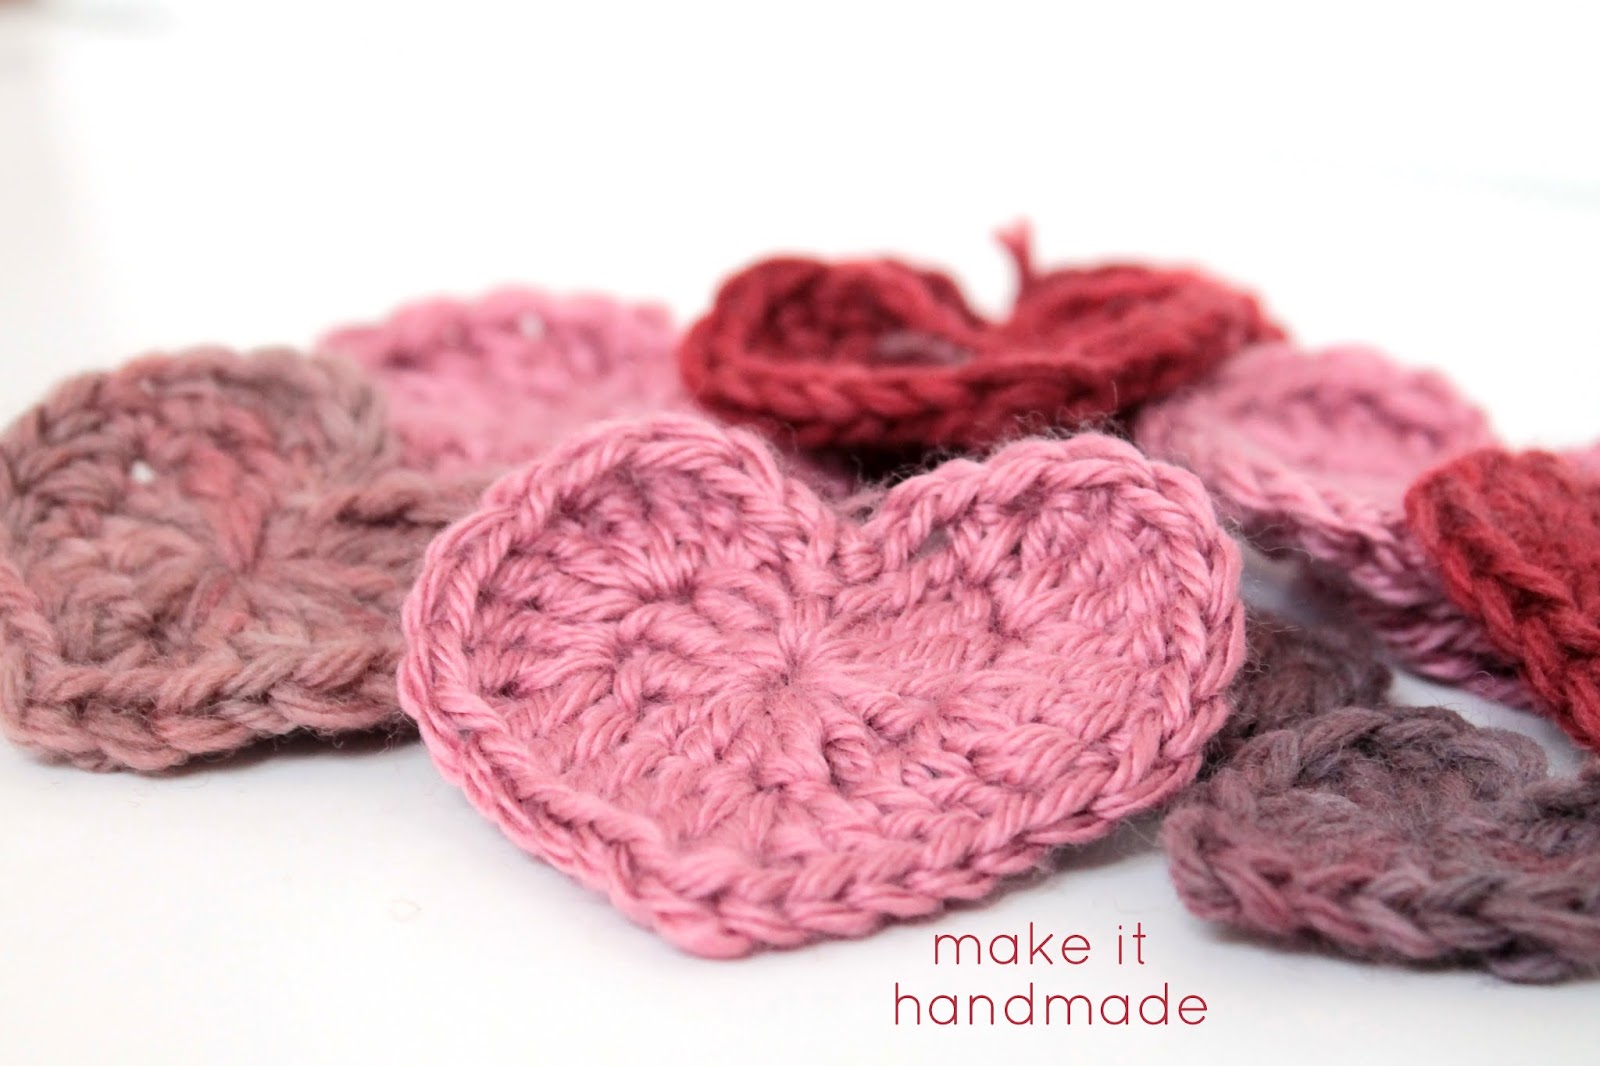 Make It Handmade: 5 Ways Use Your Crochet Hearts